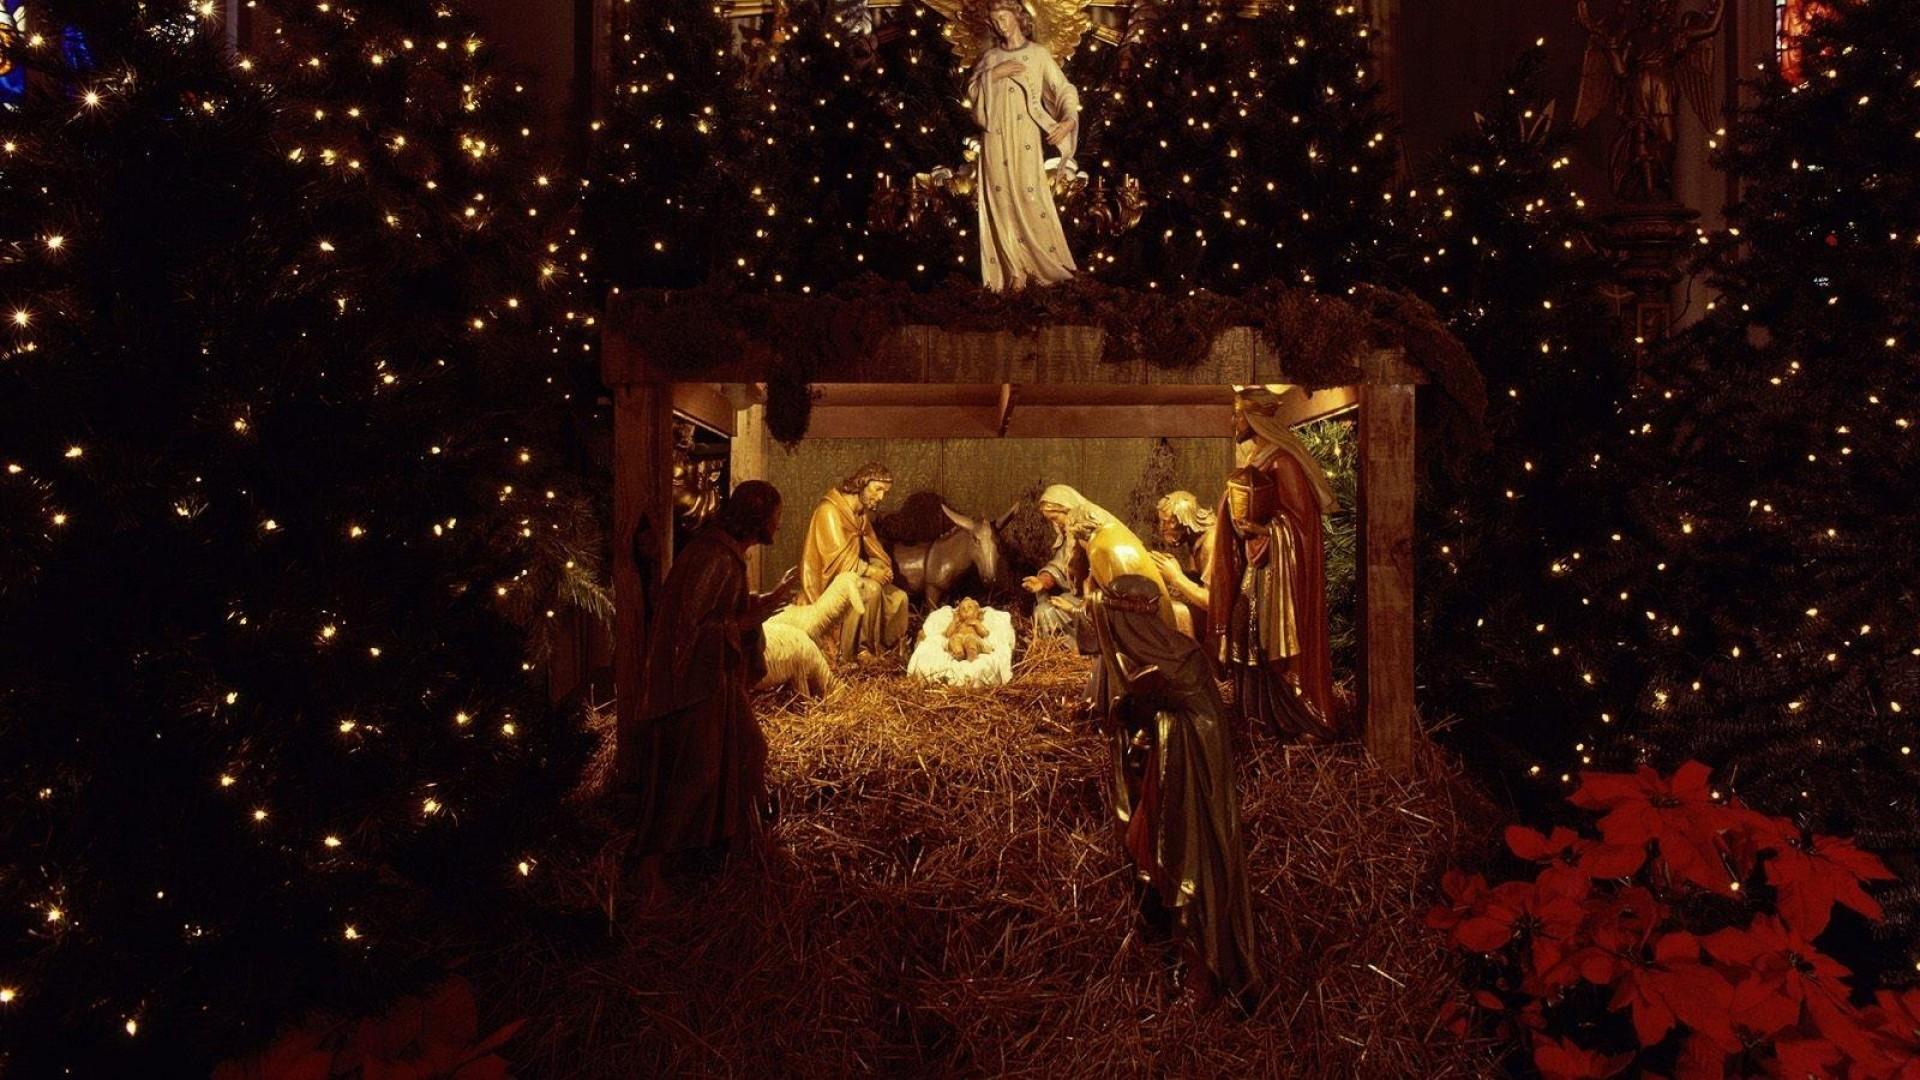 Christmas Wallpapers Hd 1080p: Christmas HD Wallpaper 1080p 1920x1080 (72+ Images